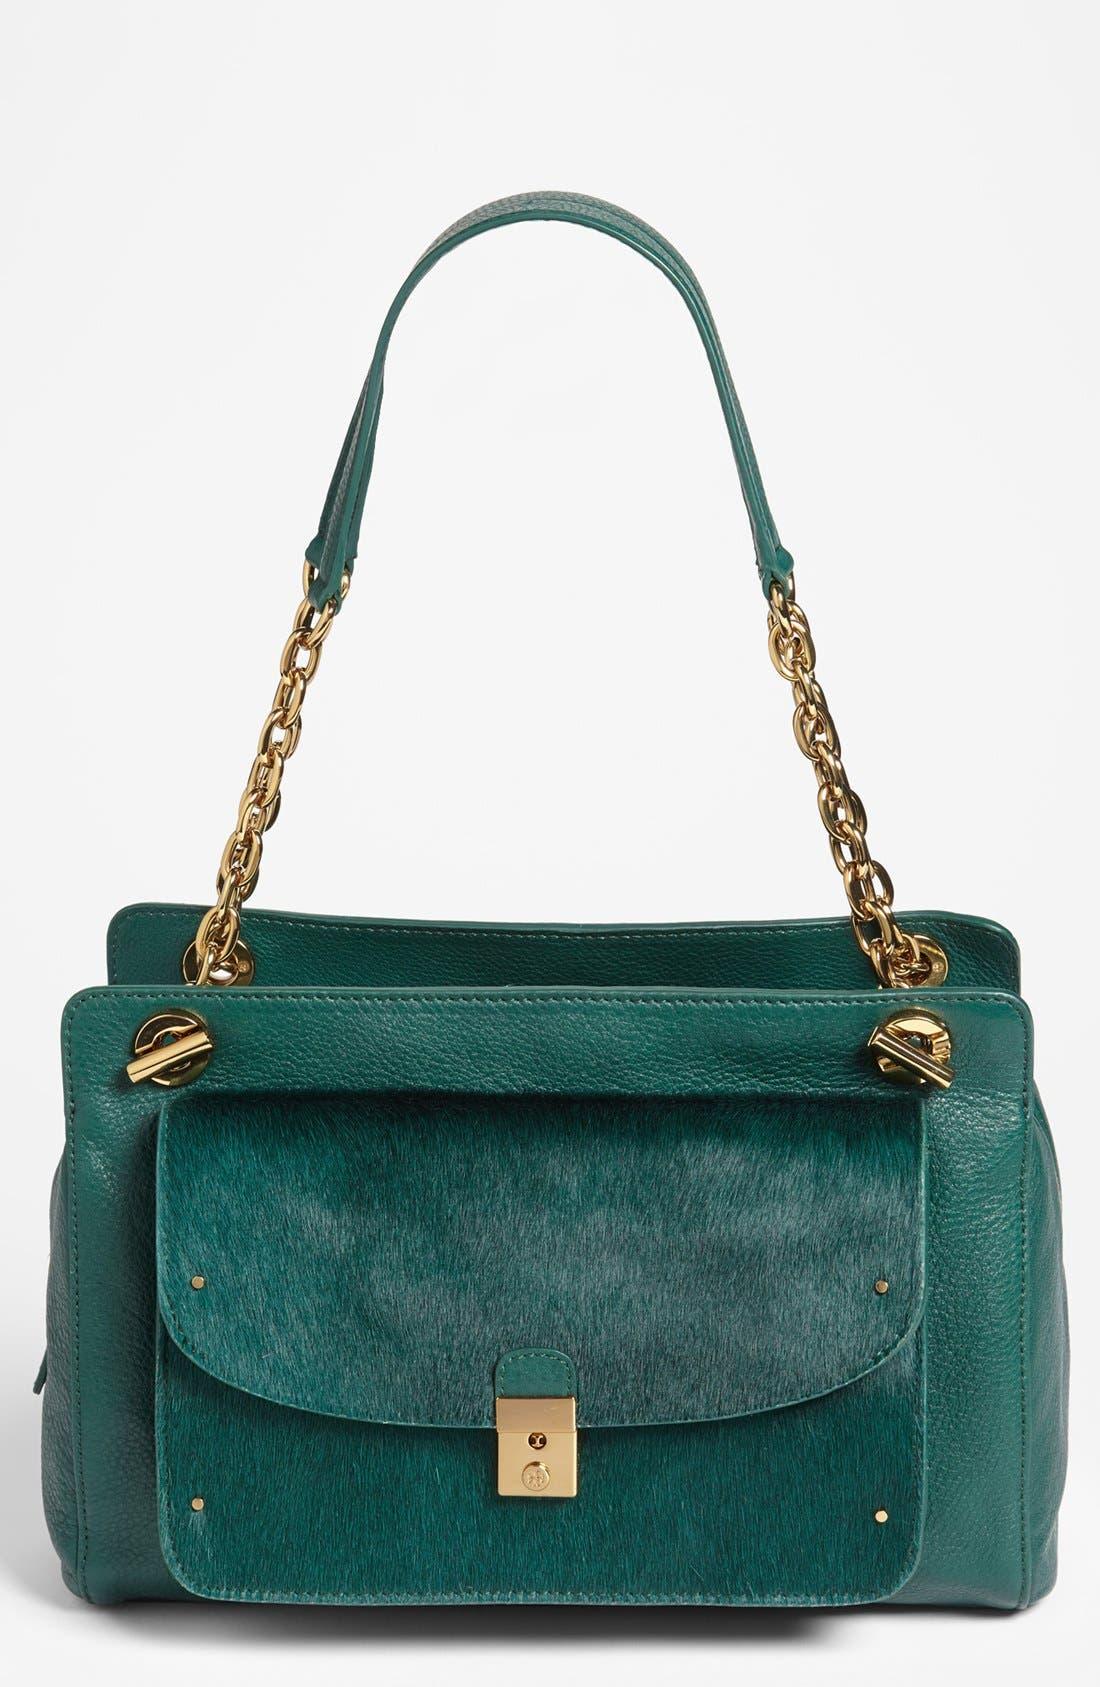 Alternate Image 1 Selected - Tory Burch 'Priscilla' Leather & Calf Hair Shoulder Bag